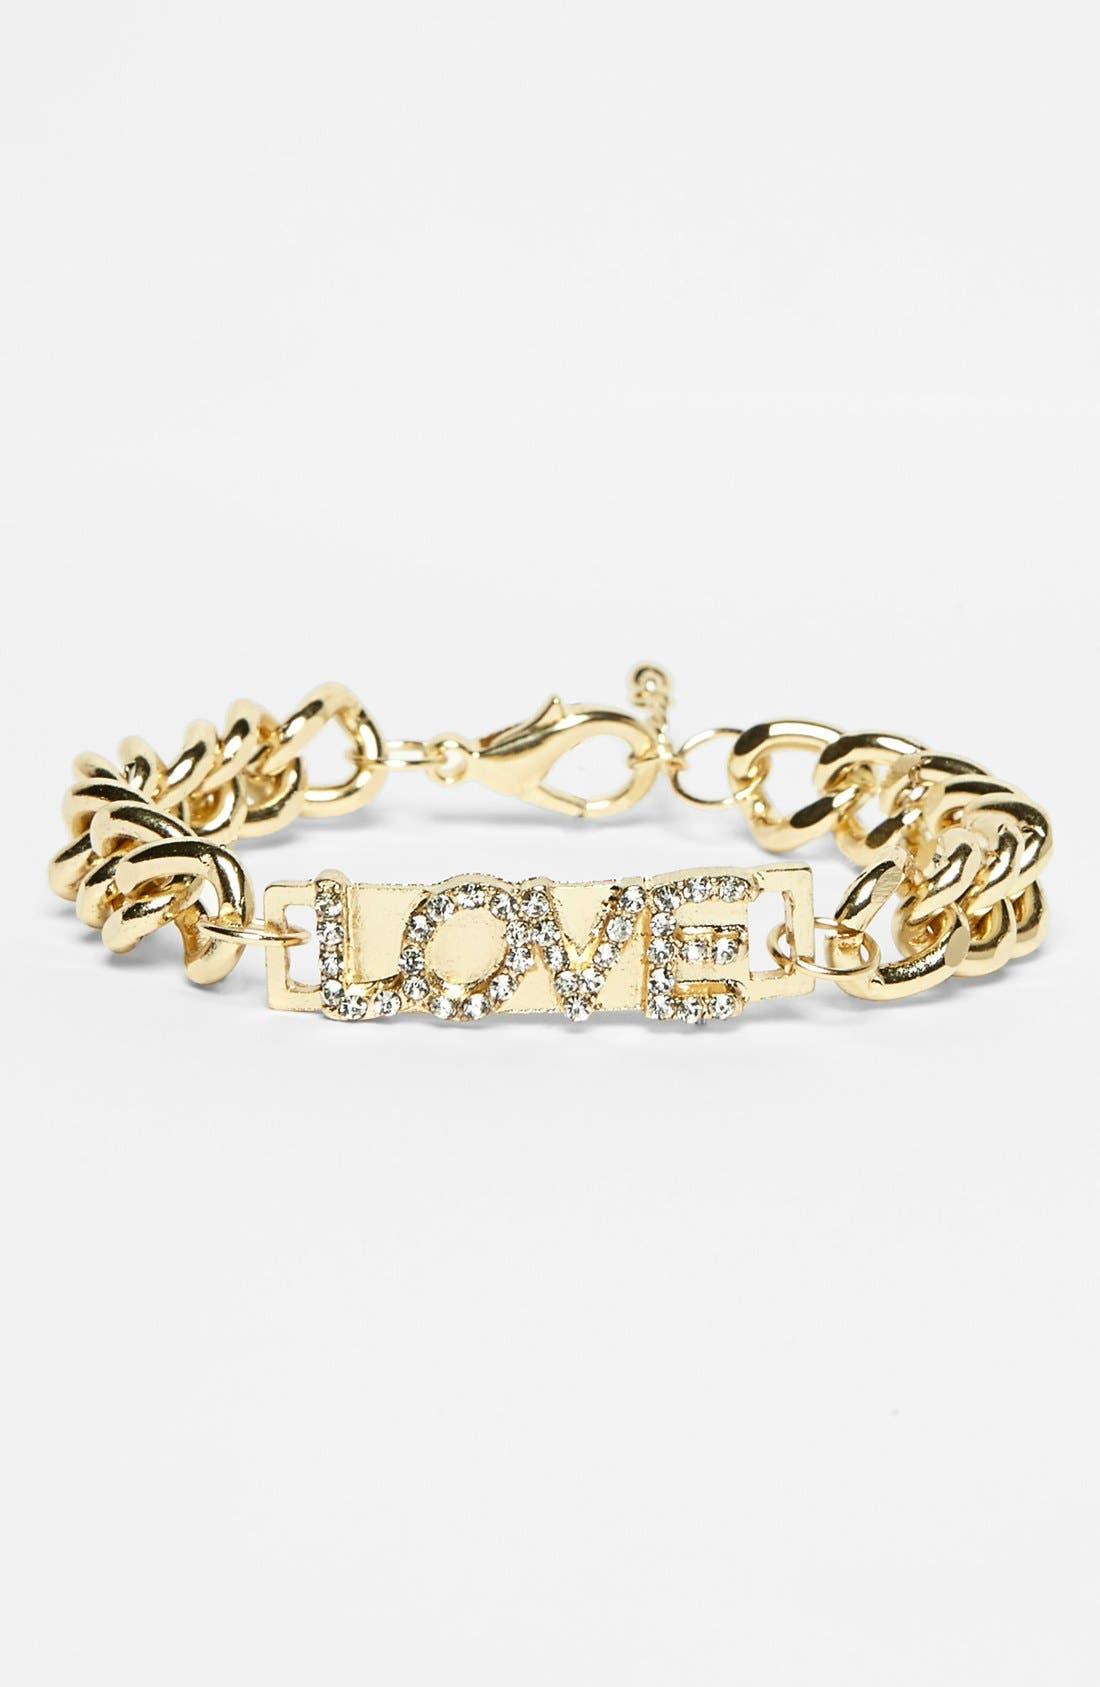 Alternate Image 1 Selected - Stephan & Co. 'Love' Chain Link Bracelet (Juniors) (Online Only)